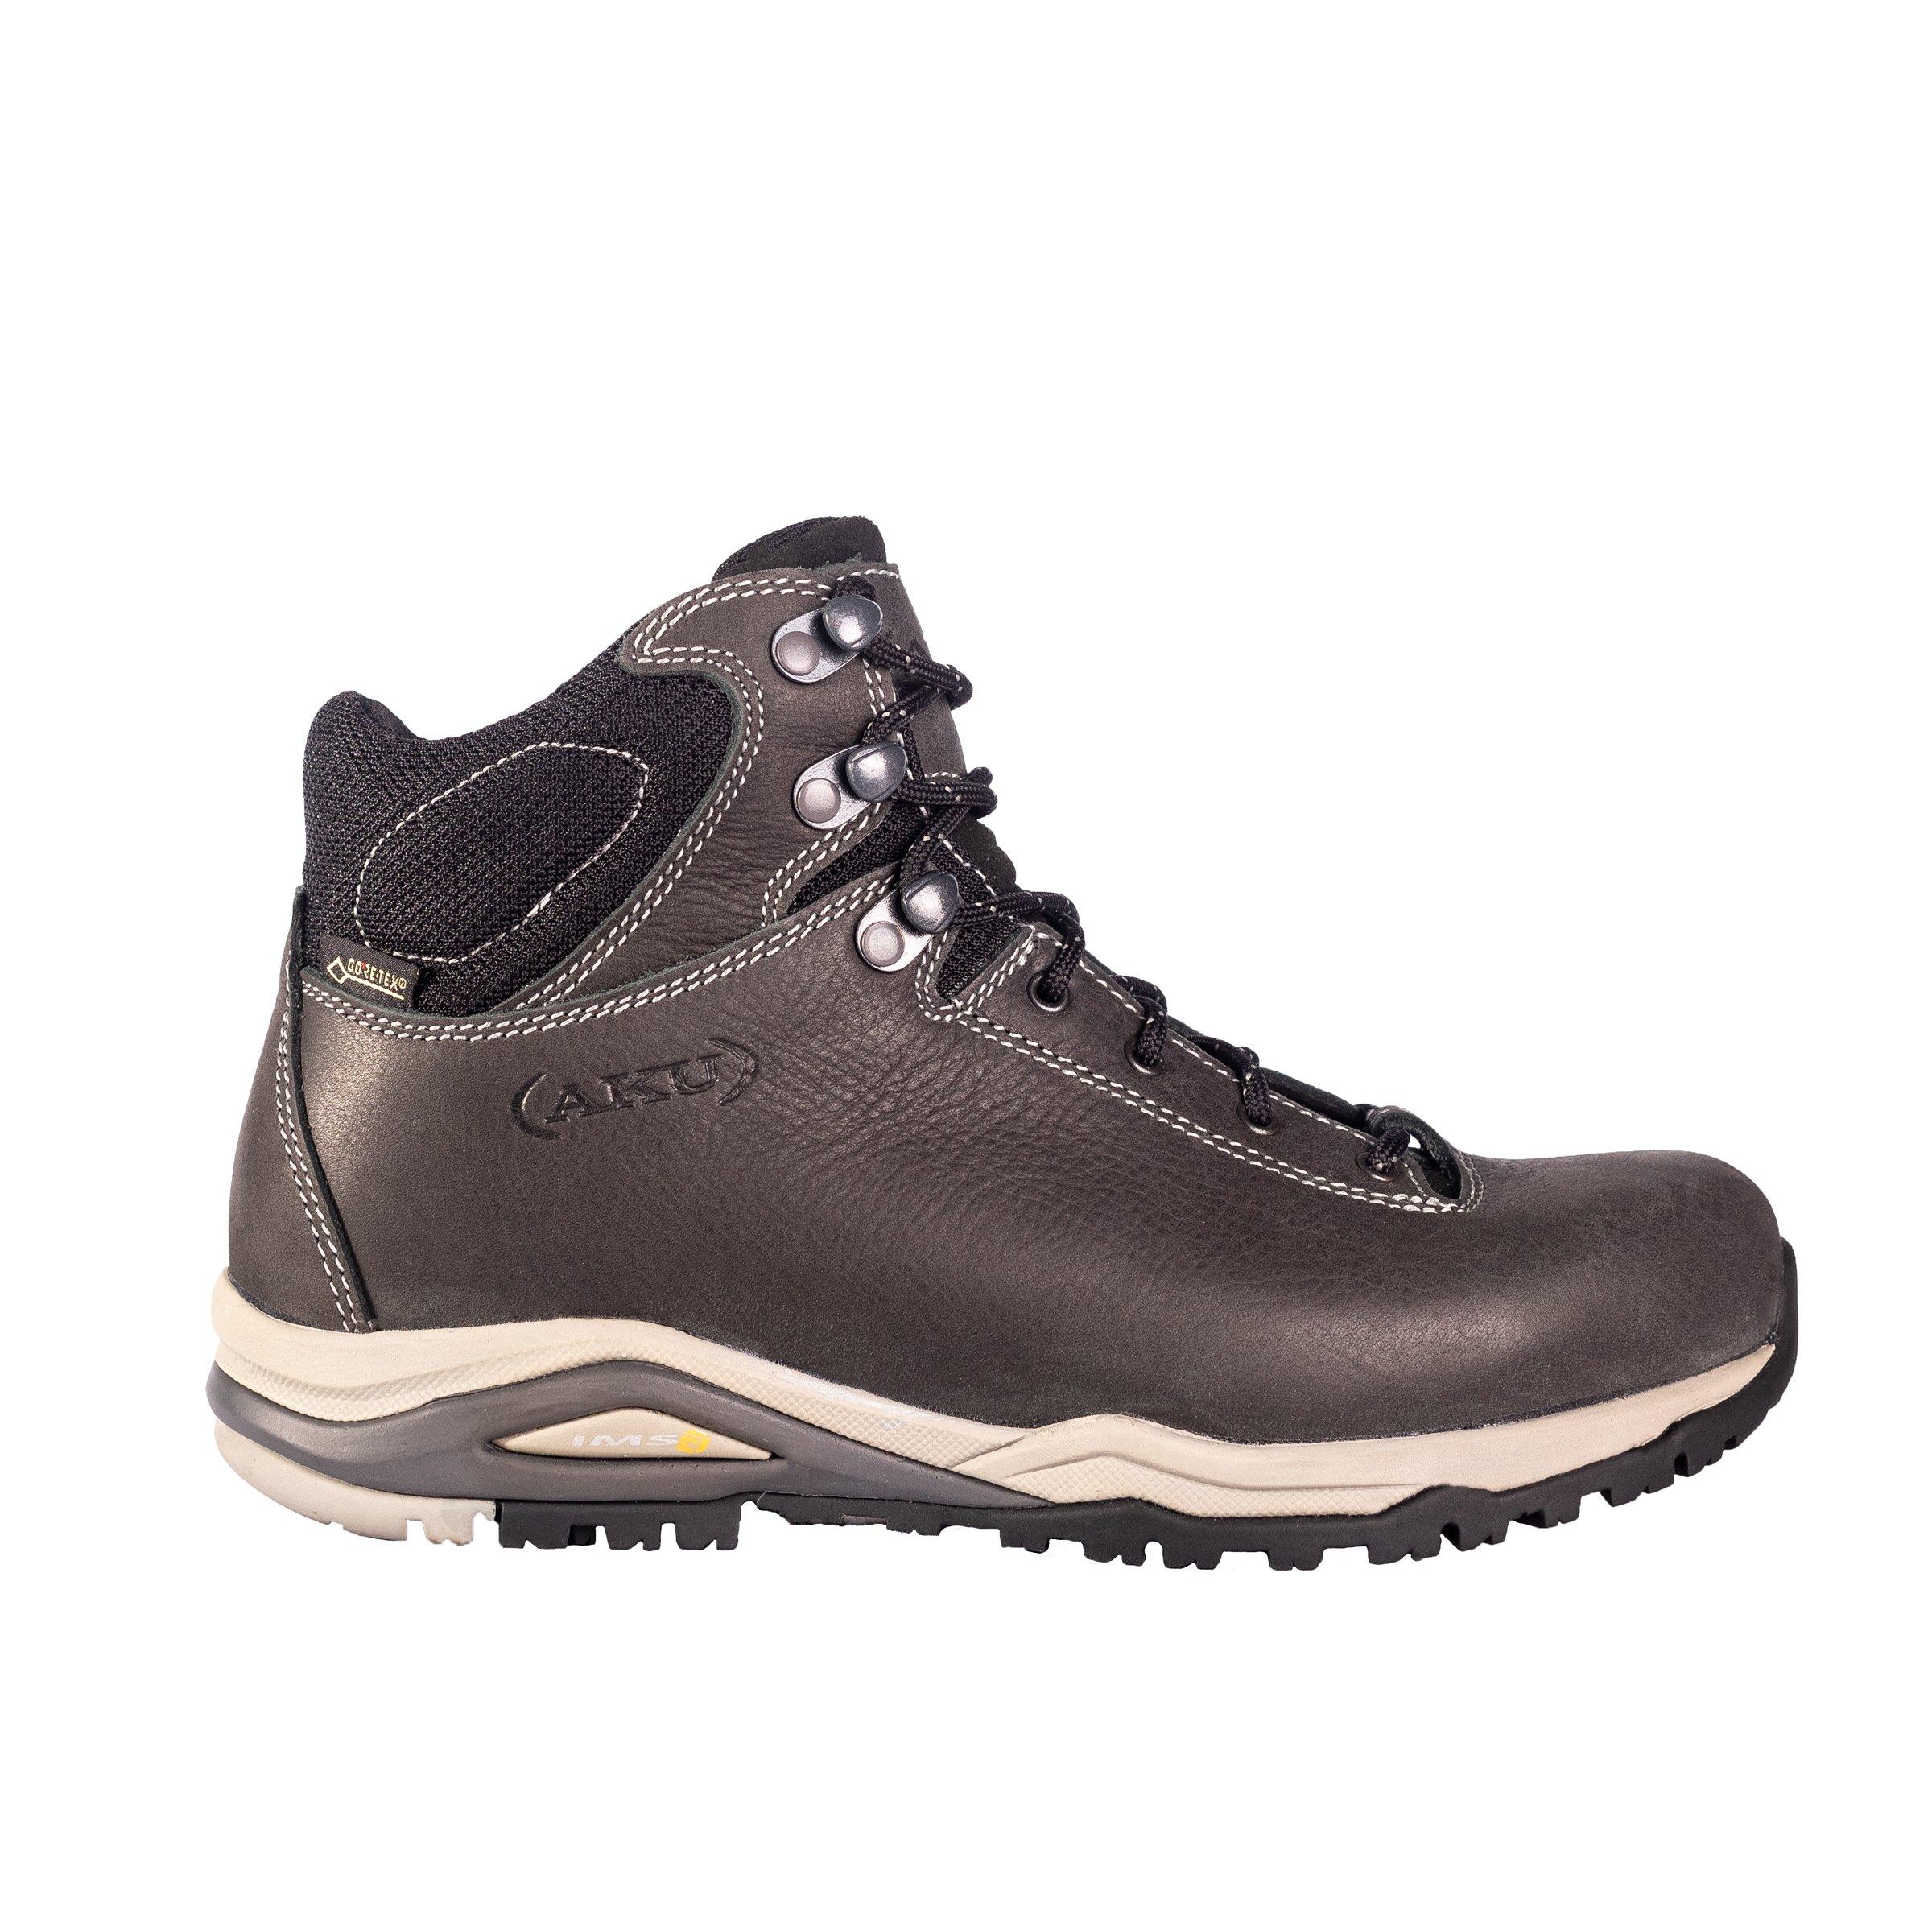 05e96f84 Buty ALPINA FULL GRAIN GORE-TEX | buty \ damskie \ trekkingowe ...